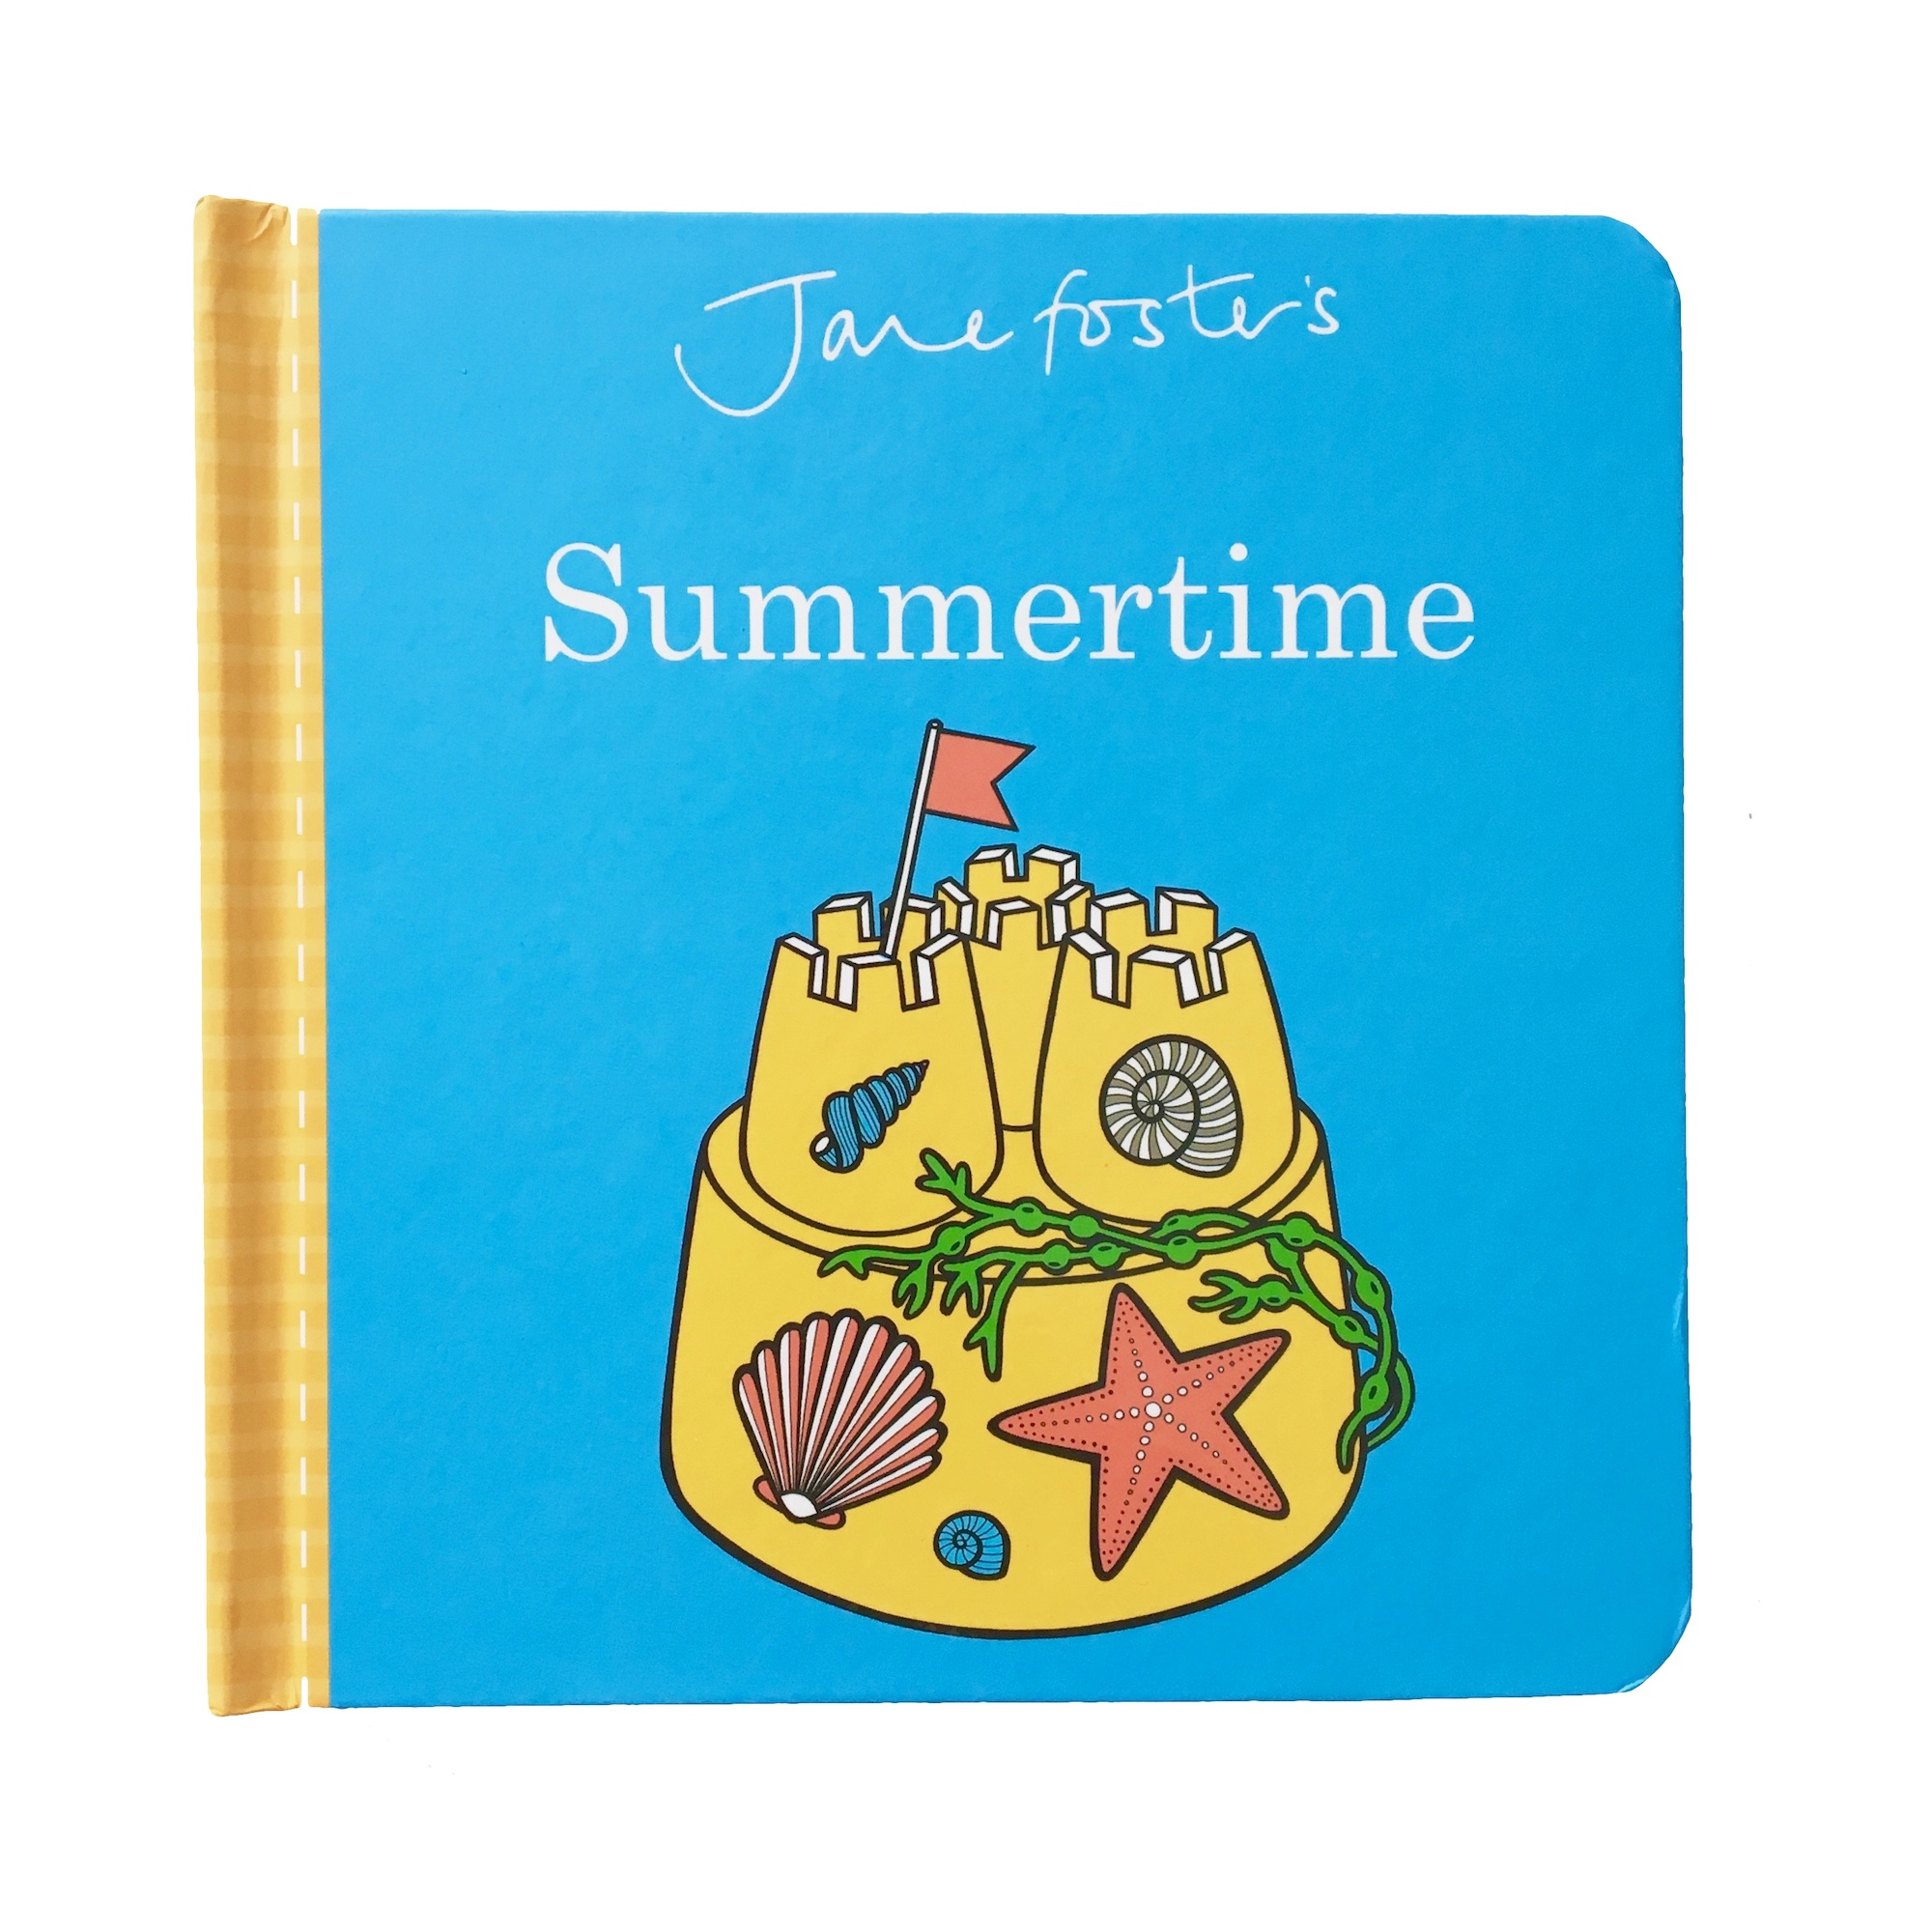 Summertime Book photo.jpg